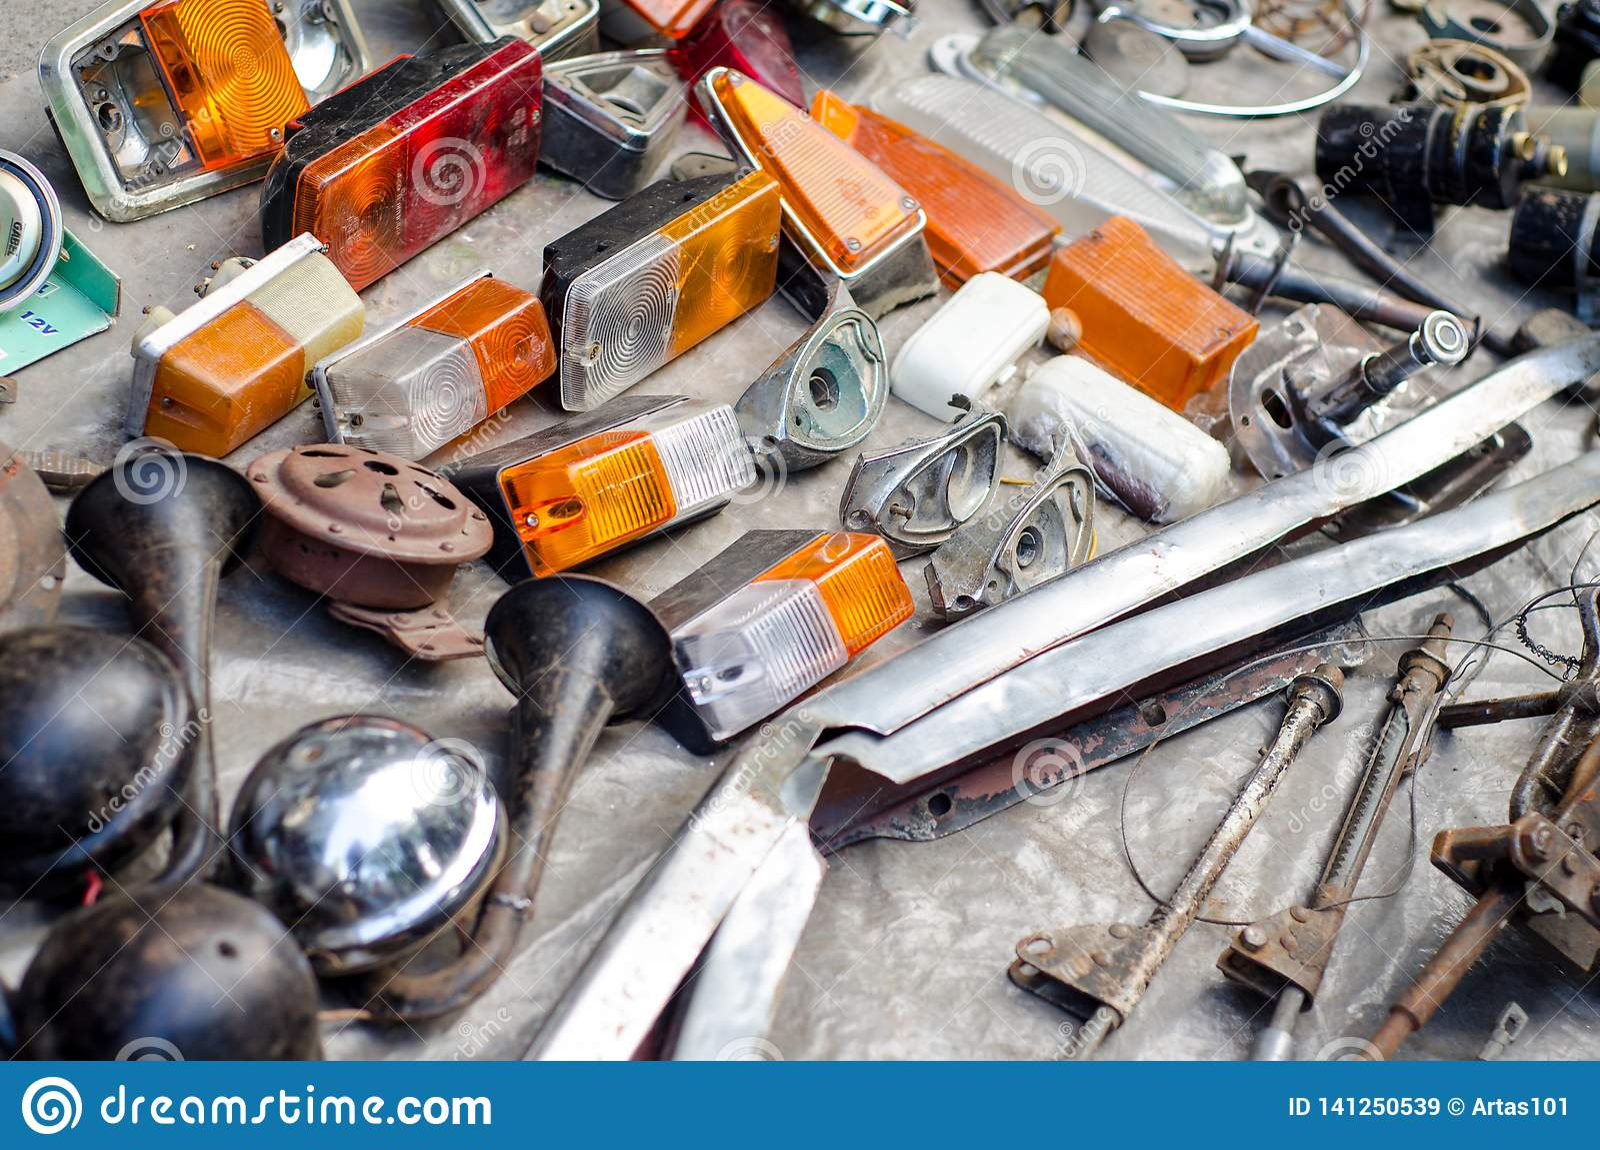 Auto Parts For Sale >> Auto Parts For Sale Stock Image Image Of Mechanic